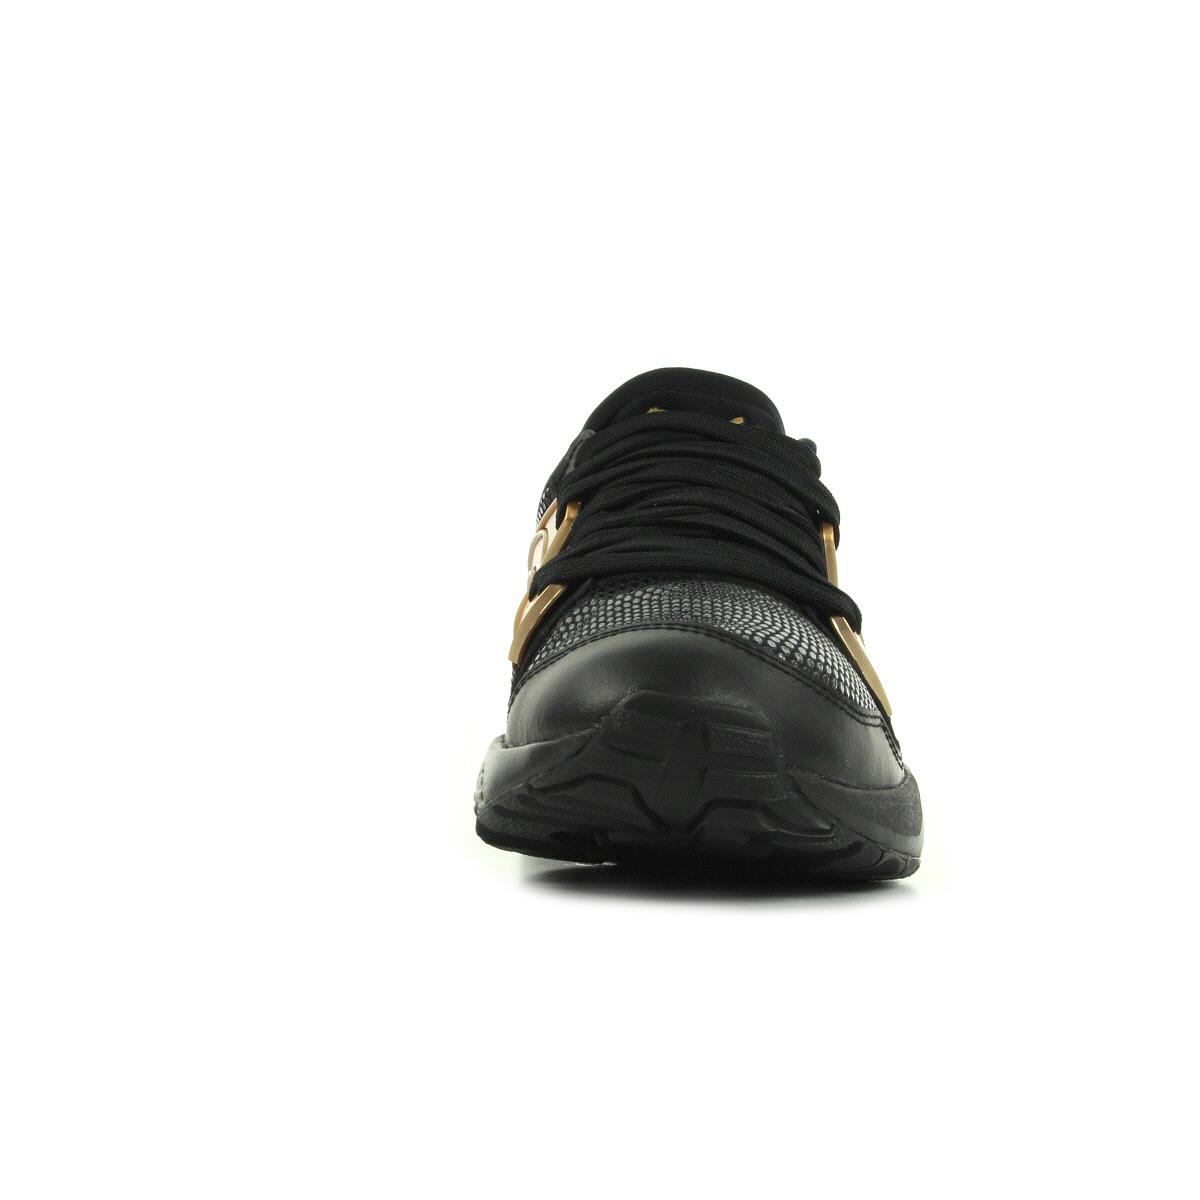 Puma Blaze GOLD Wn's 36202201, Baskets mode femme